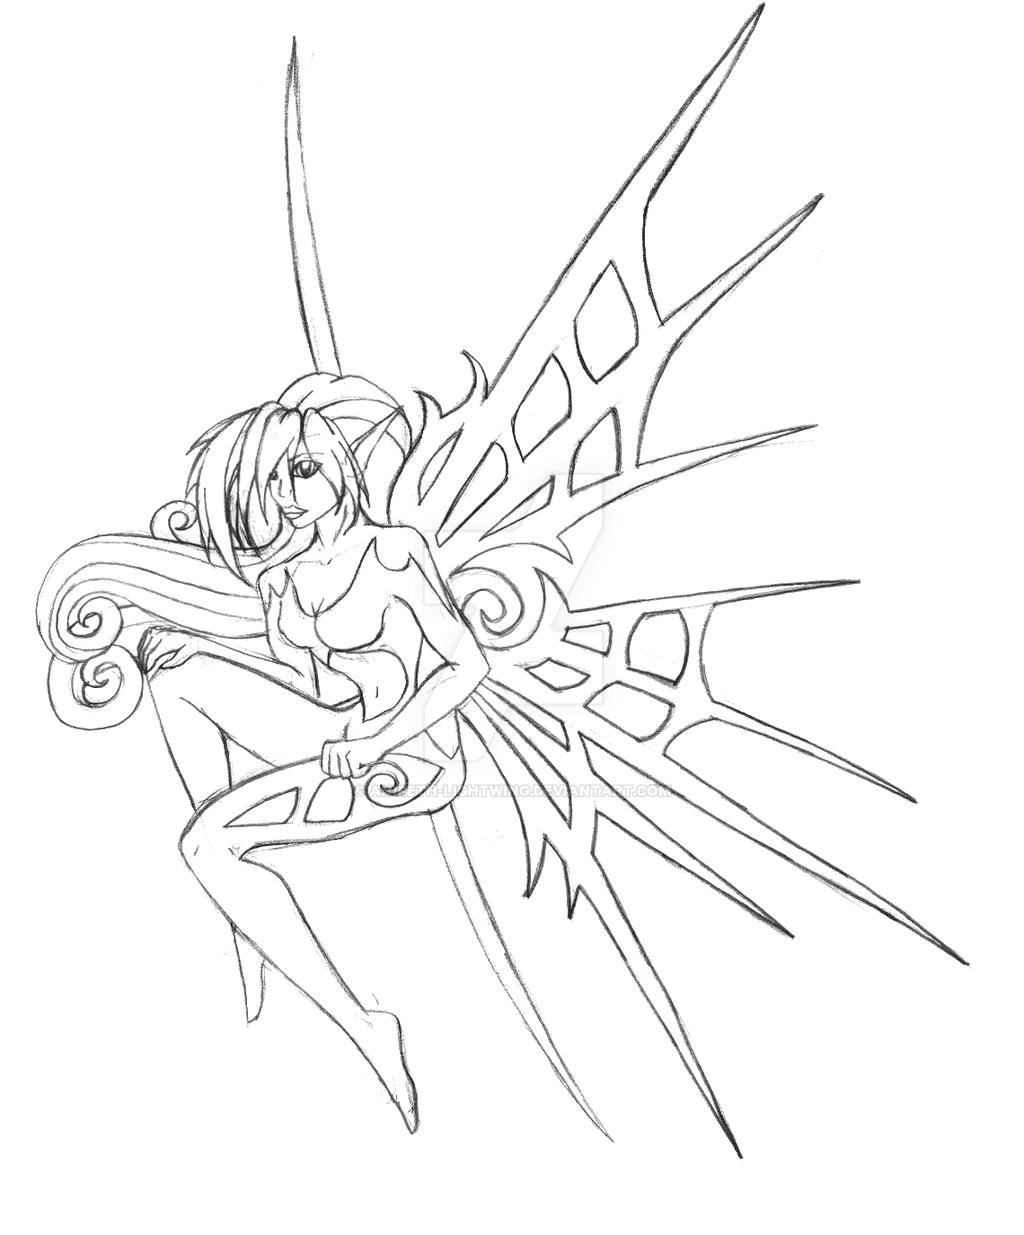 techno fairy sketch by aniseth lightwing on deviantart